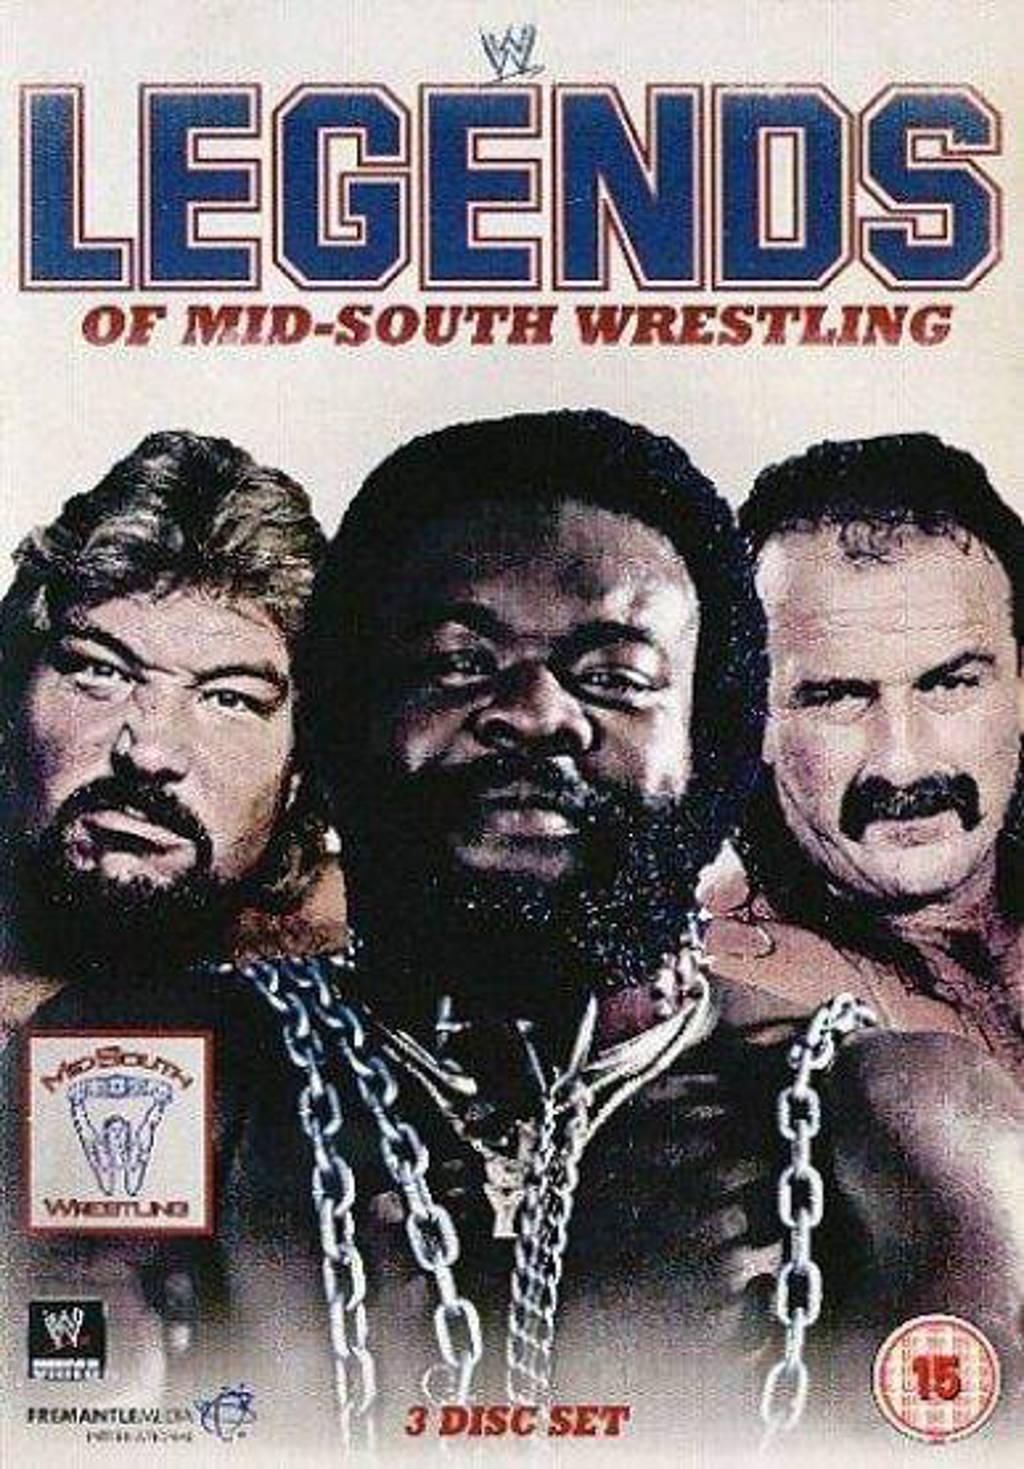 WWE - Legends Of Mid-South Wrestling (DVD)